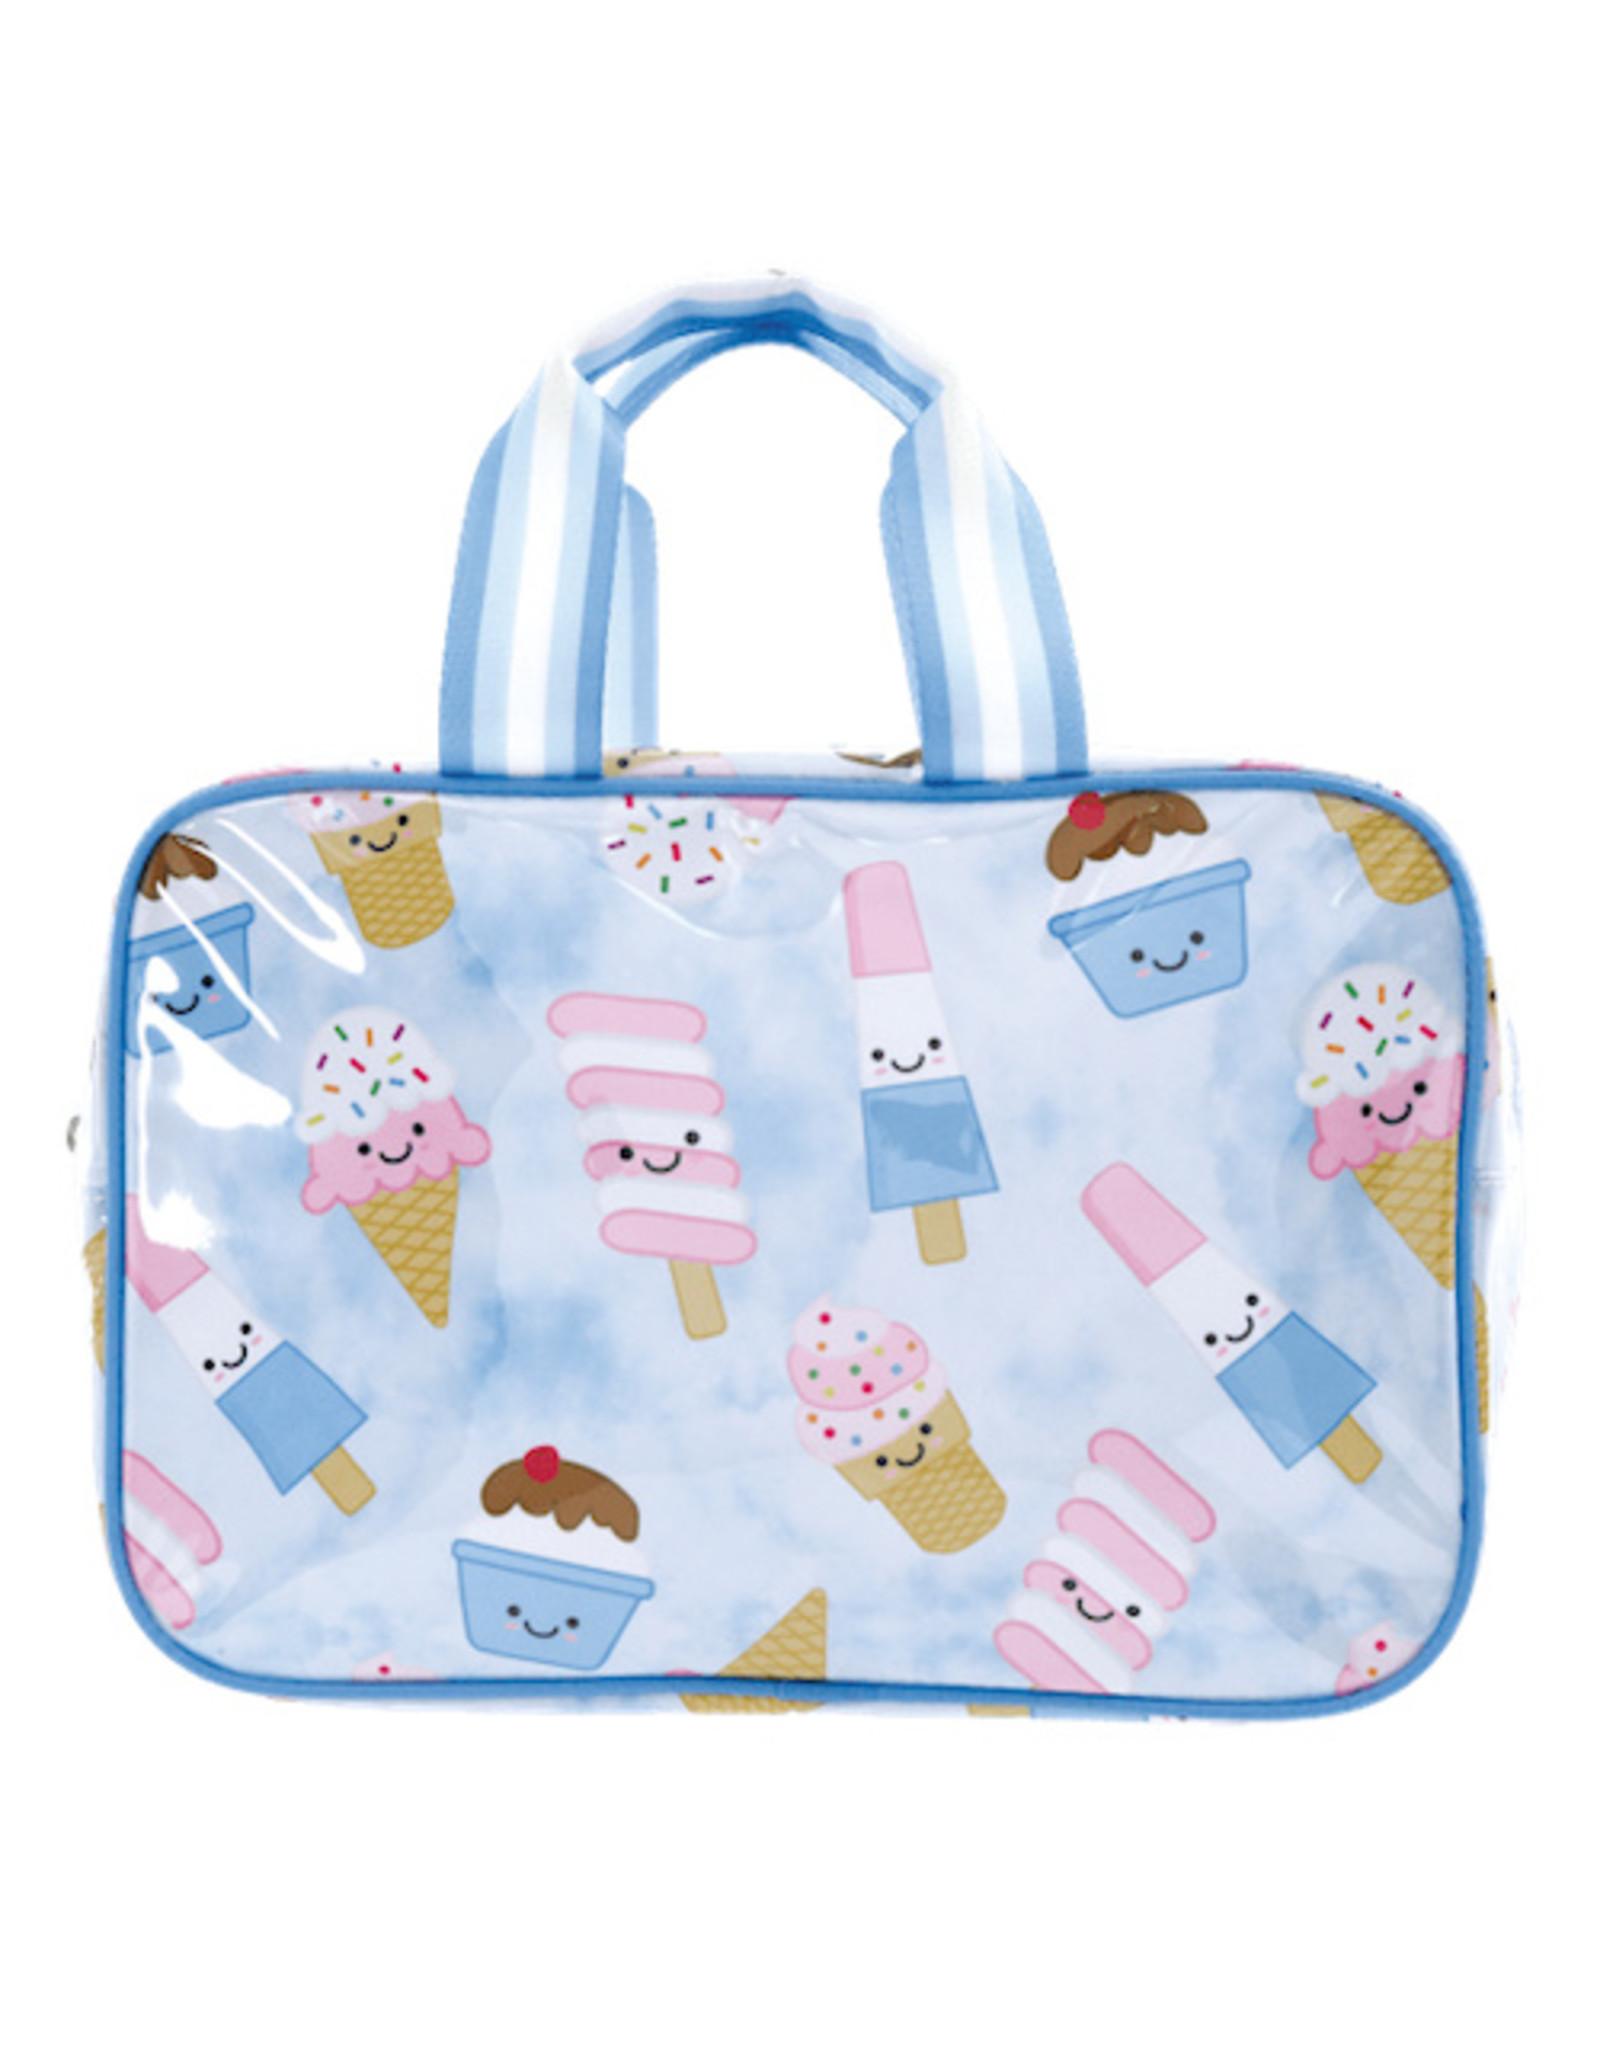 Iscream Large Cosmetic Bag